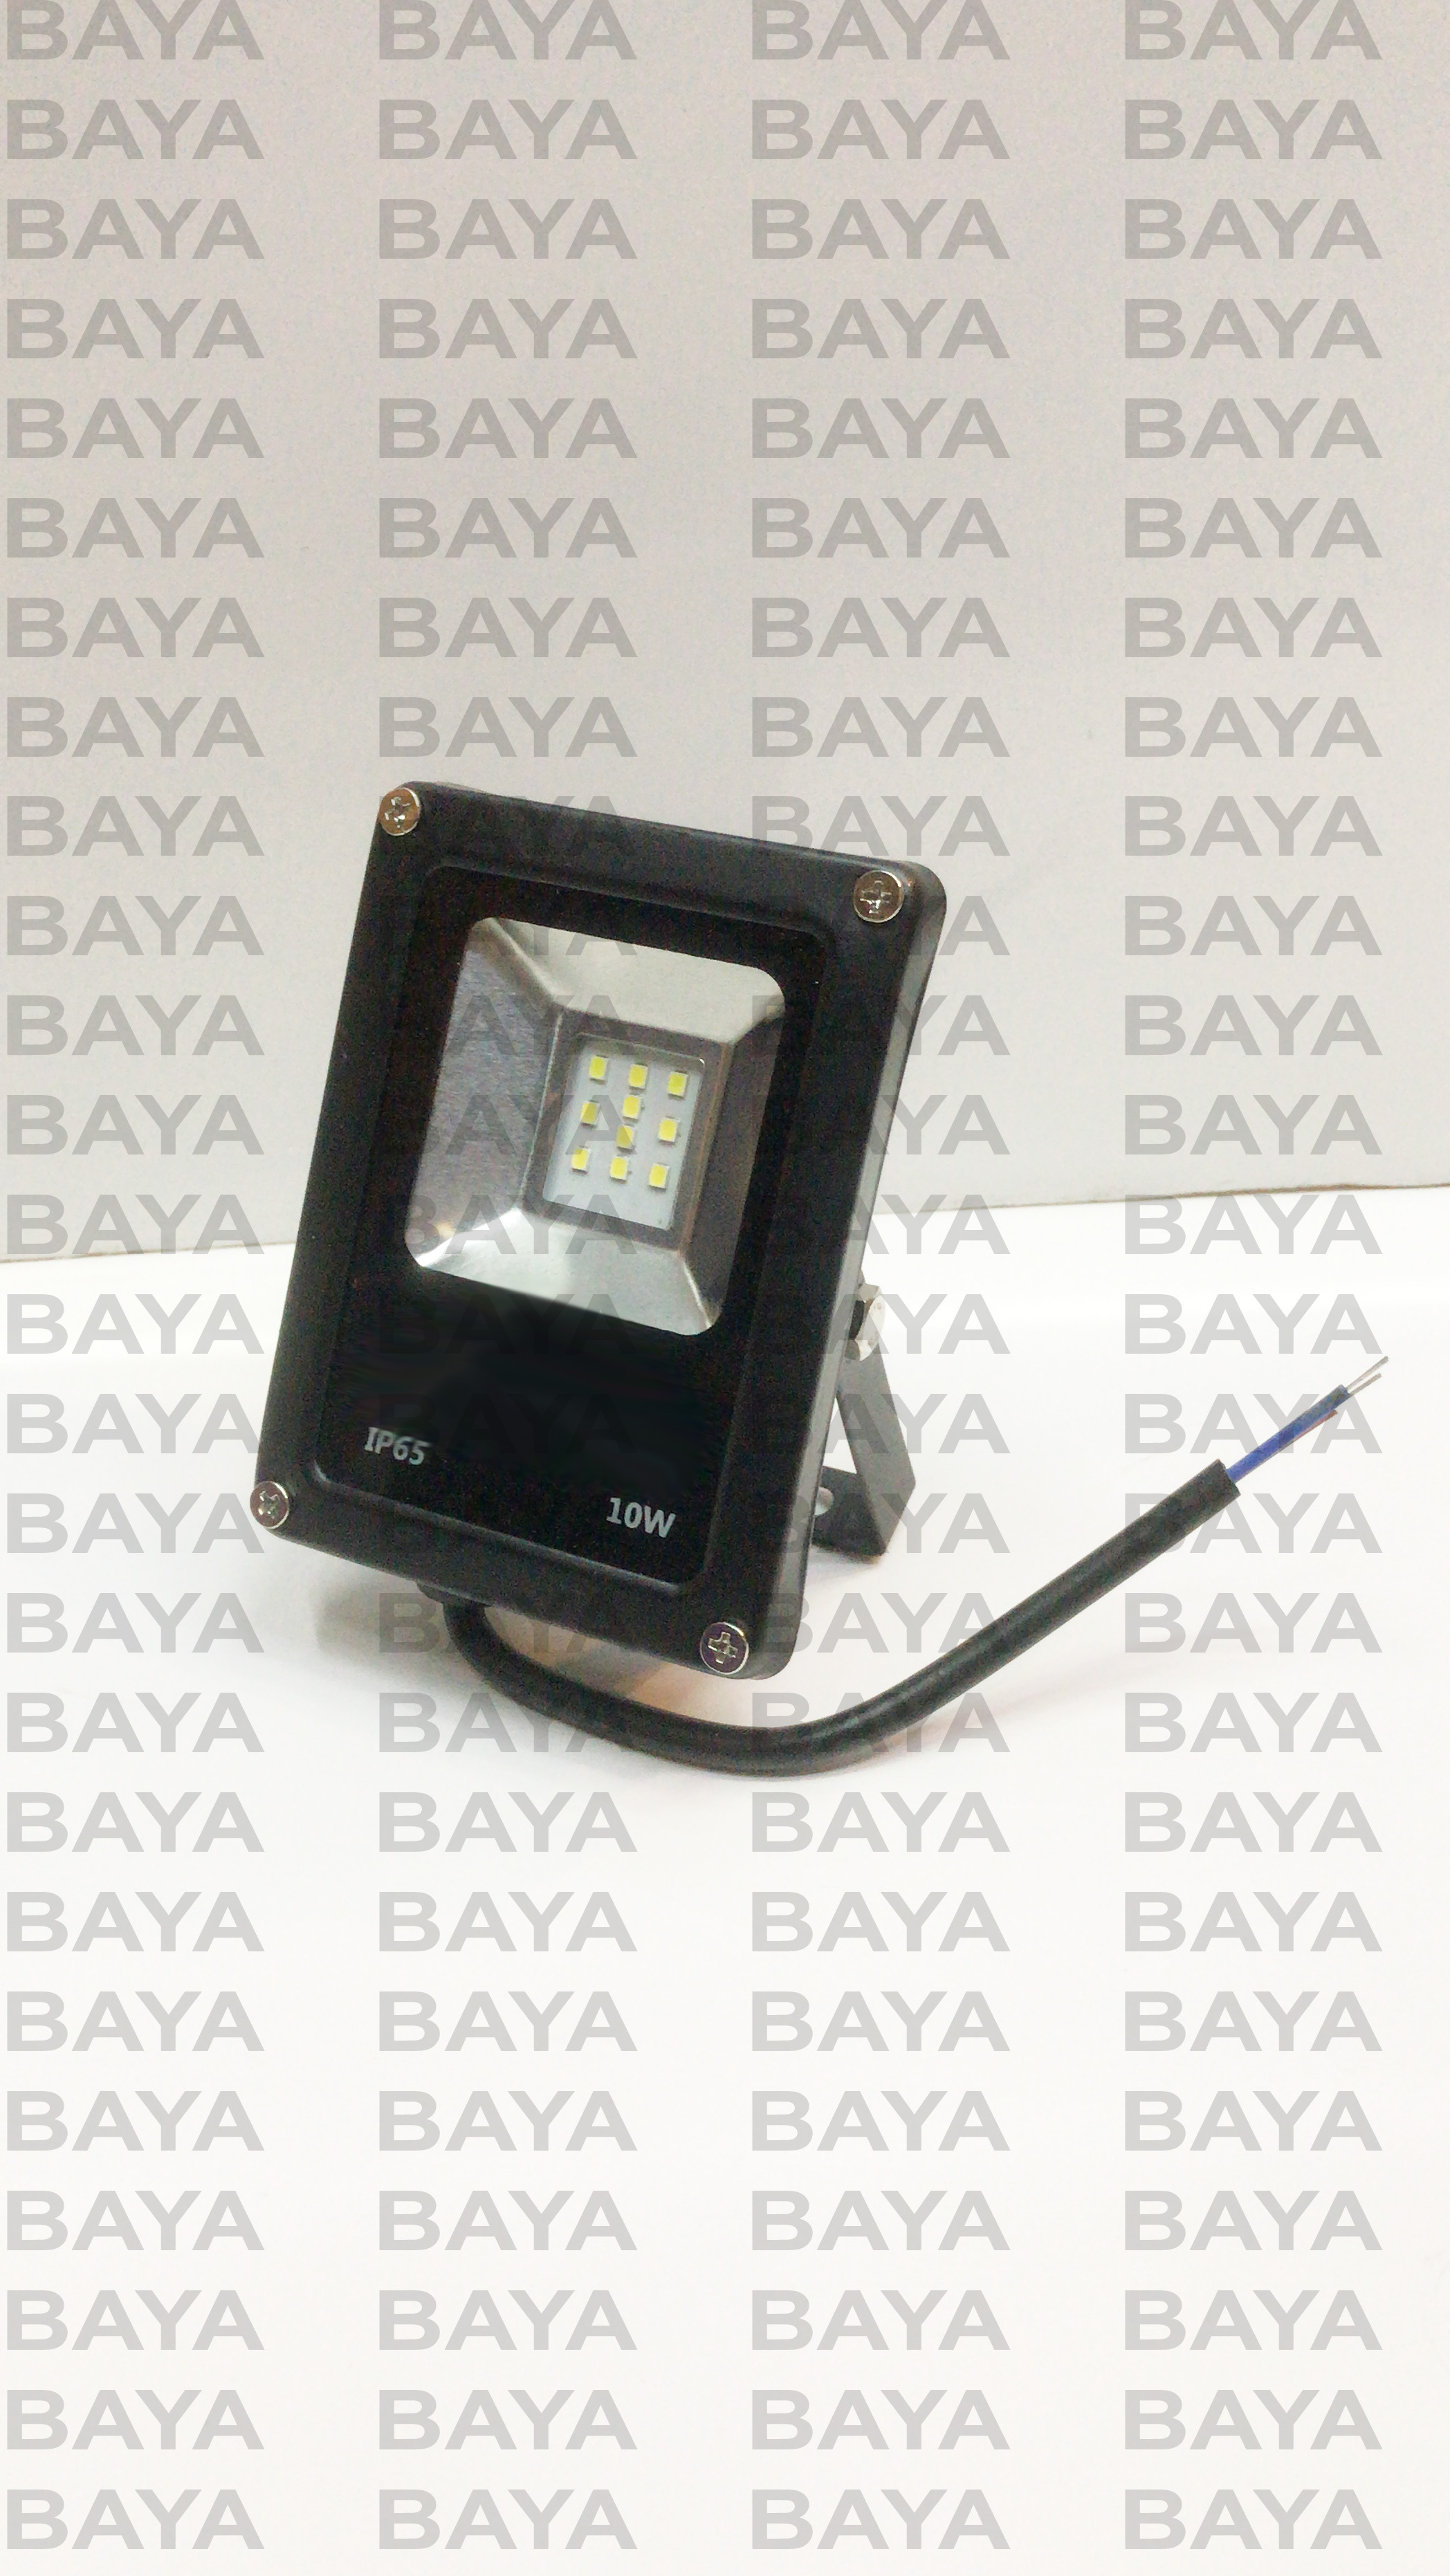 Lampu Led Sorot 10w 10 Watt Tembak Panggung Outdoor Taman Lapangan Lazada Indonesia